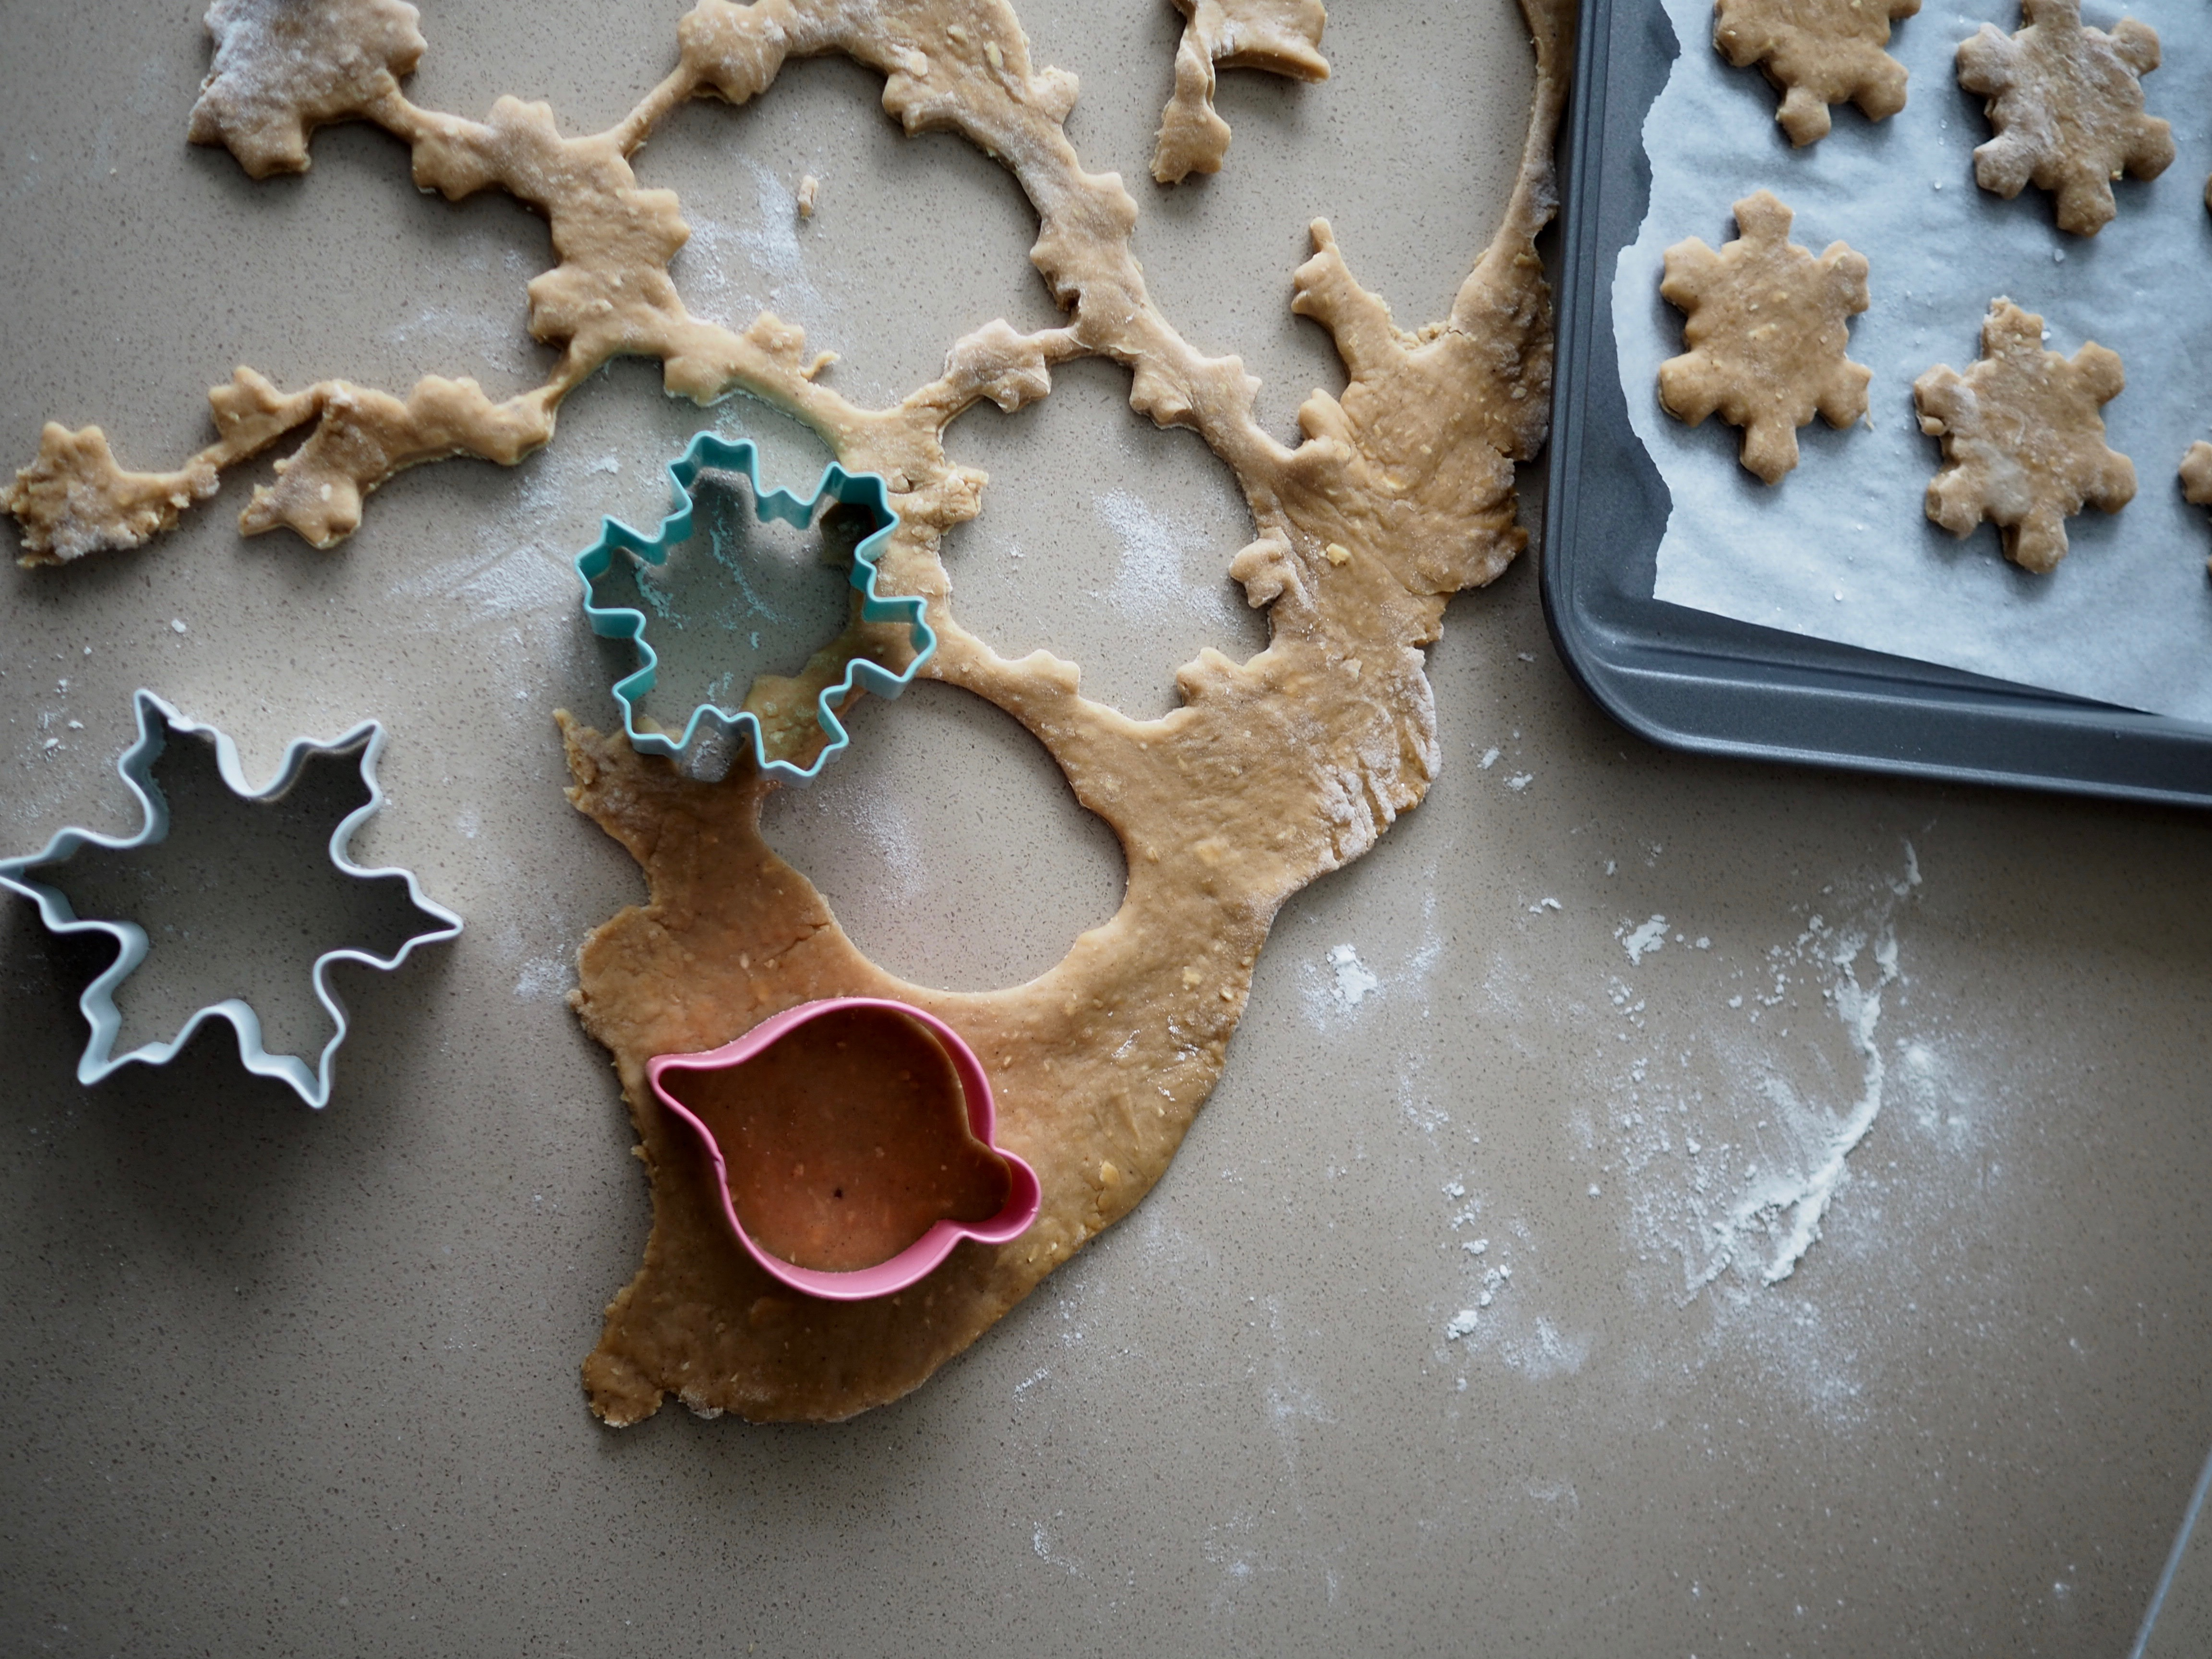 MON MODE Blog | Mon Mode | Style Blog | Toronto Blogger | A Very German Christmas | Holiday Baking